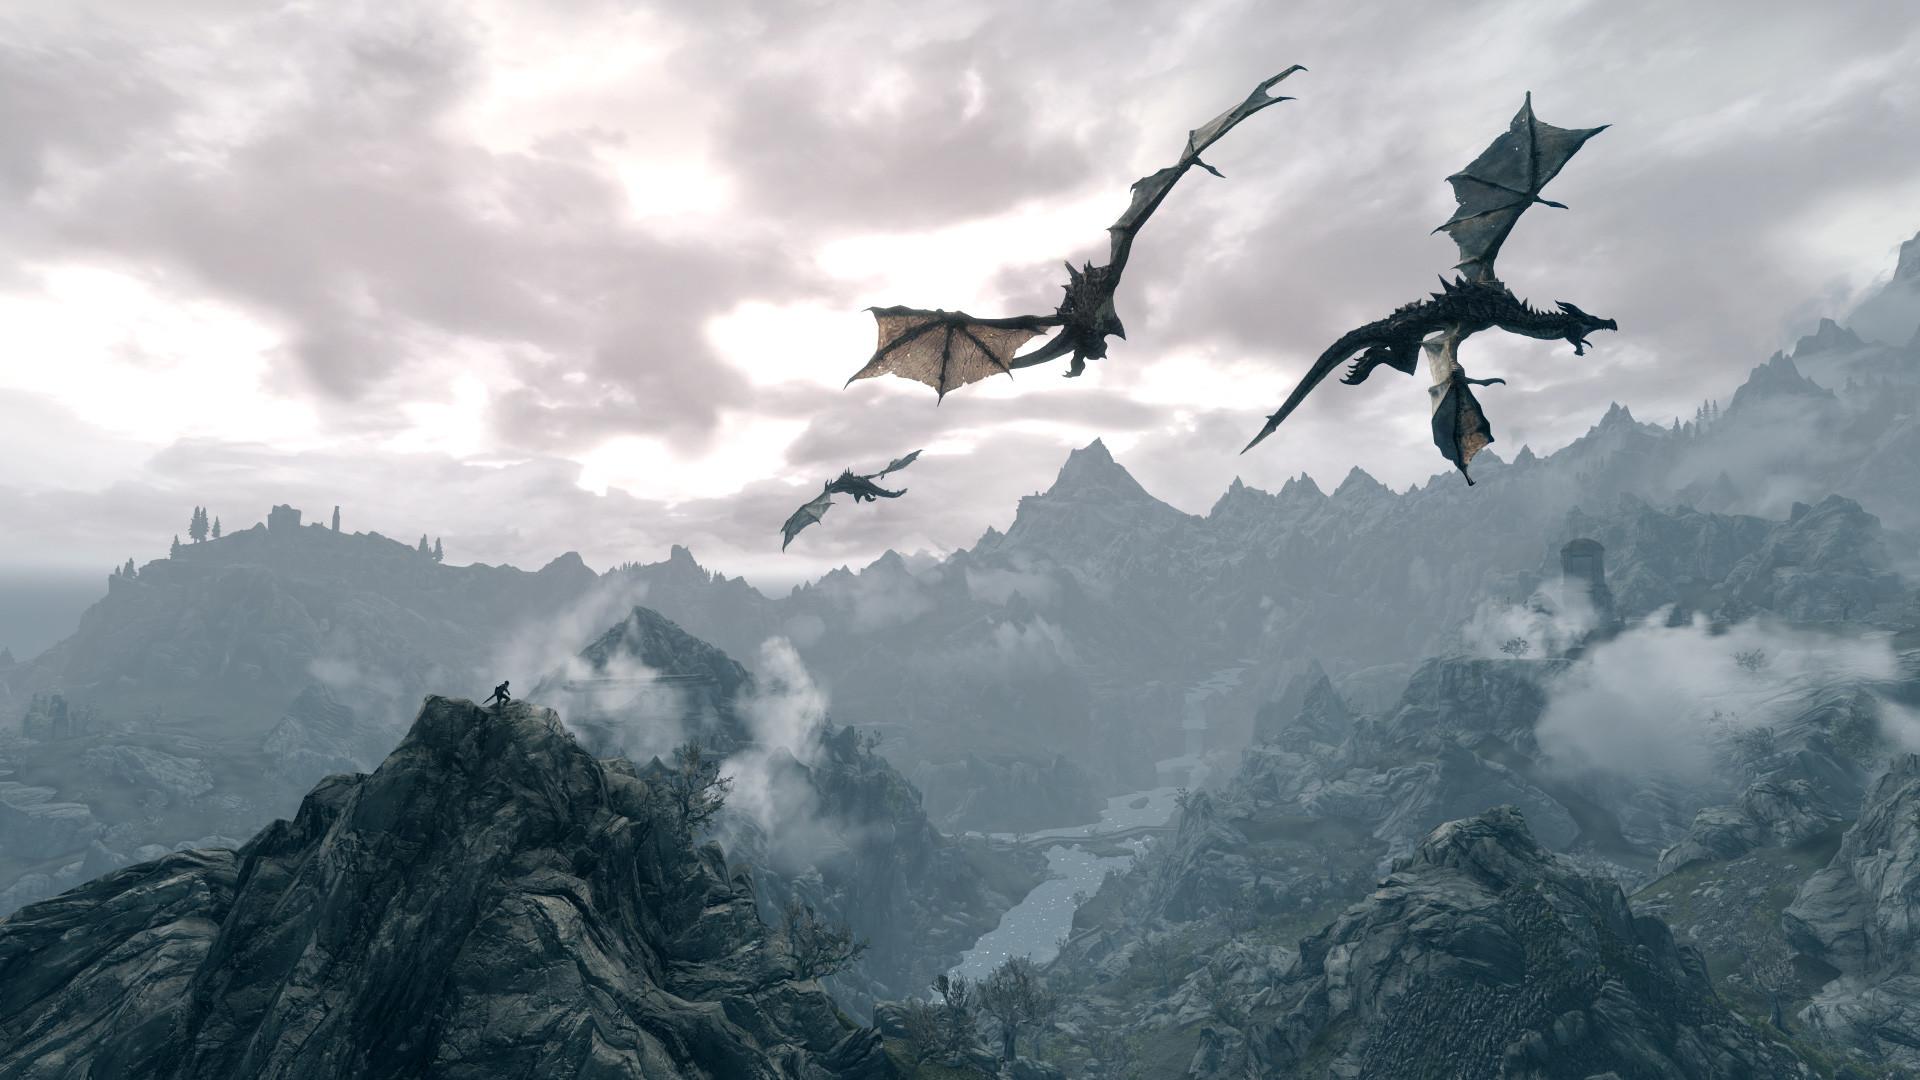 Skyrim Dragons Above HD Wallpaper